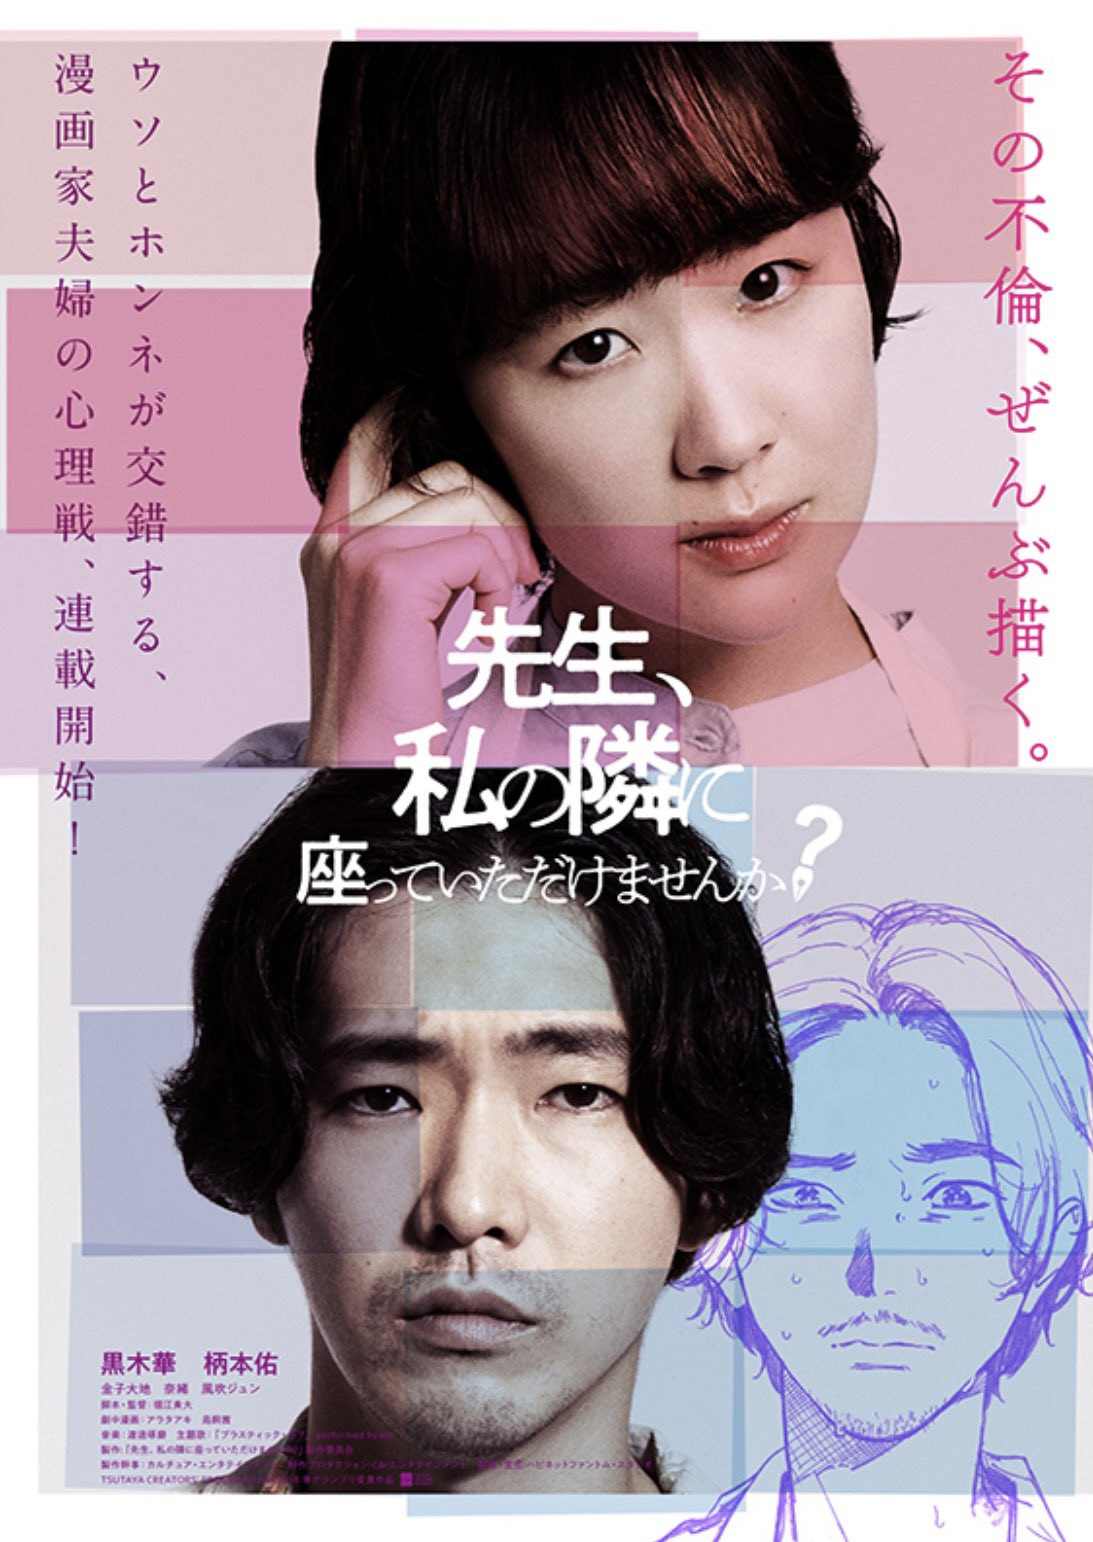 Sensei, Would You Sit Beside Me? film - Takahiro Horie - poster